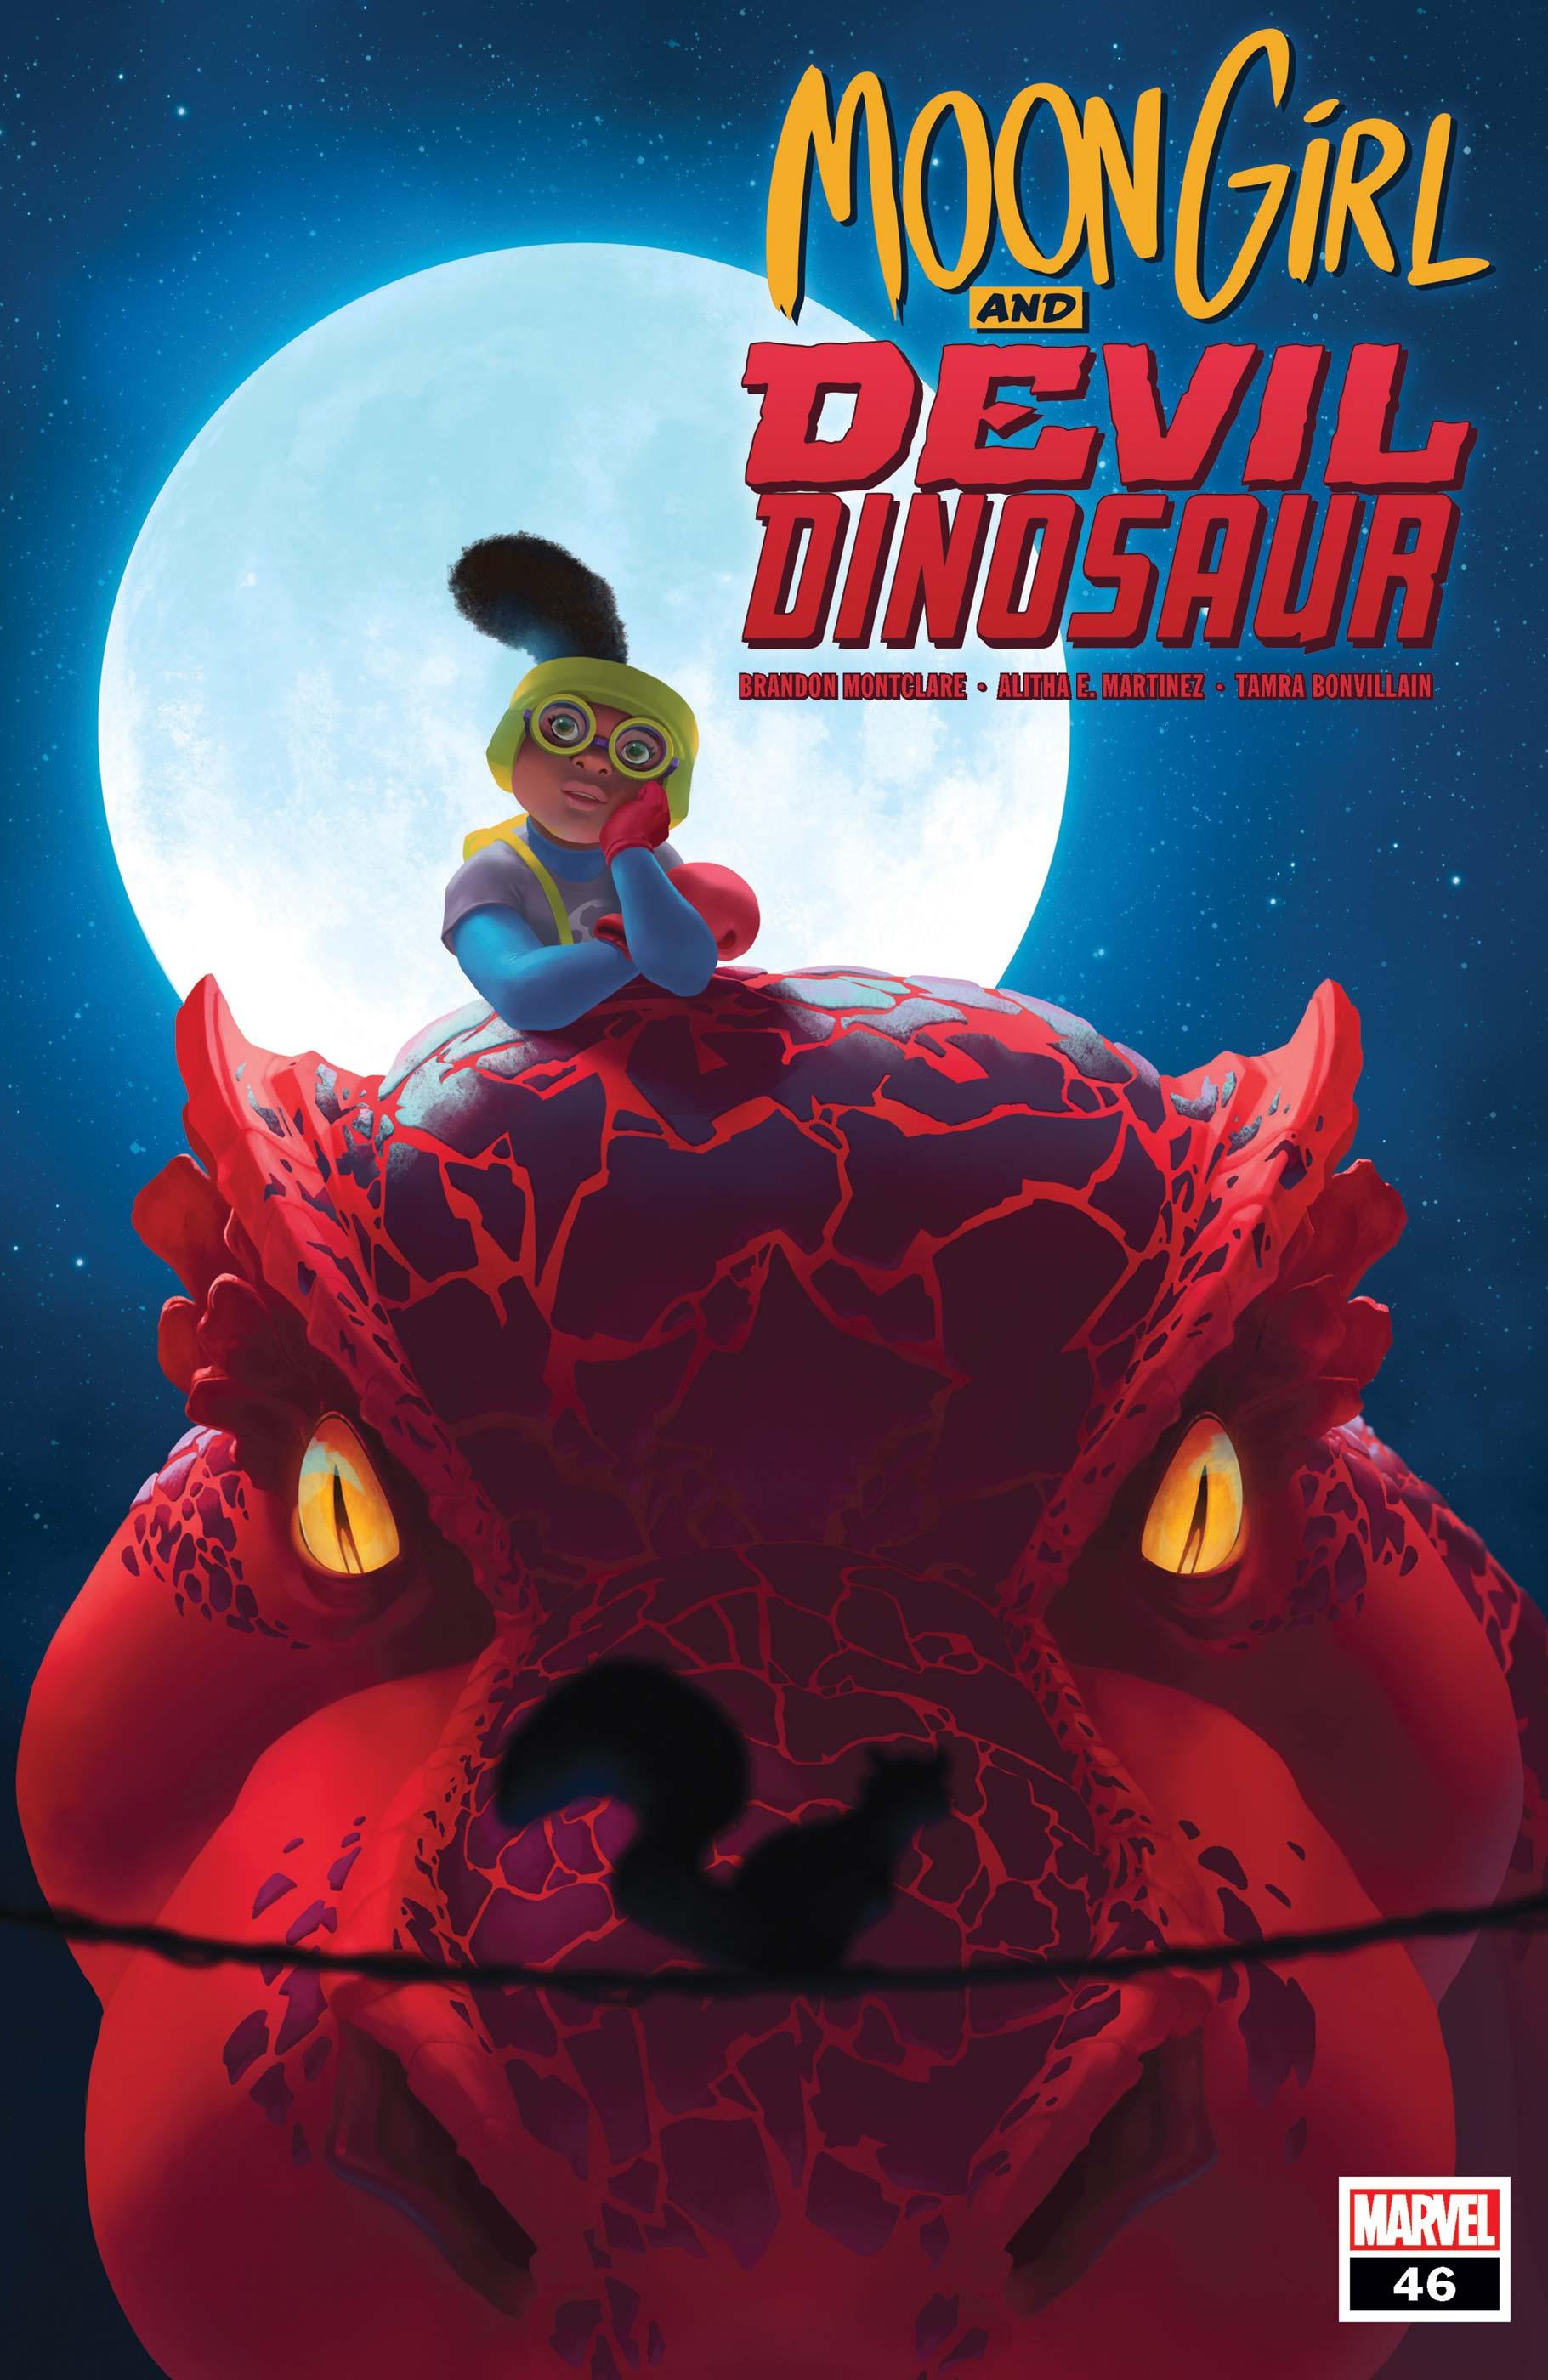 Moon Girl and Devil Dinosaur (2015) #46